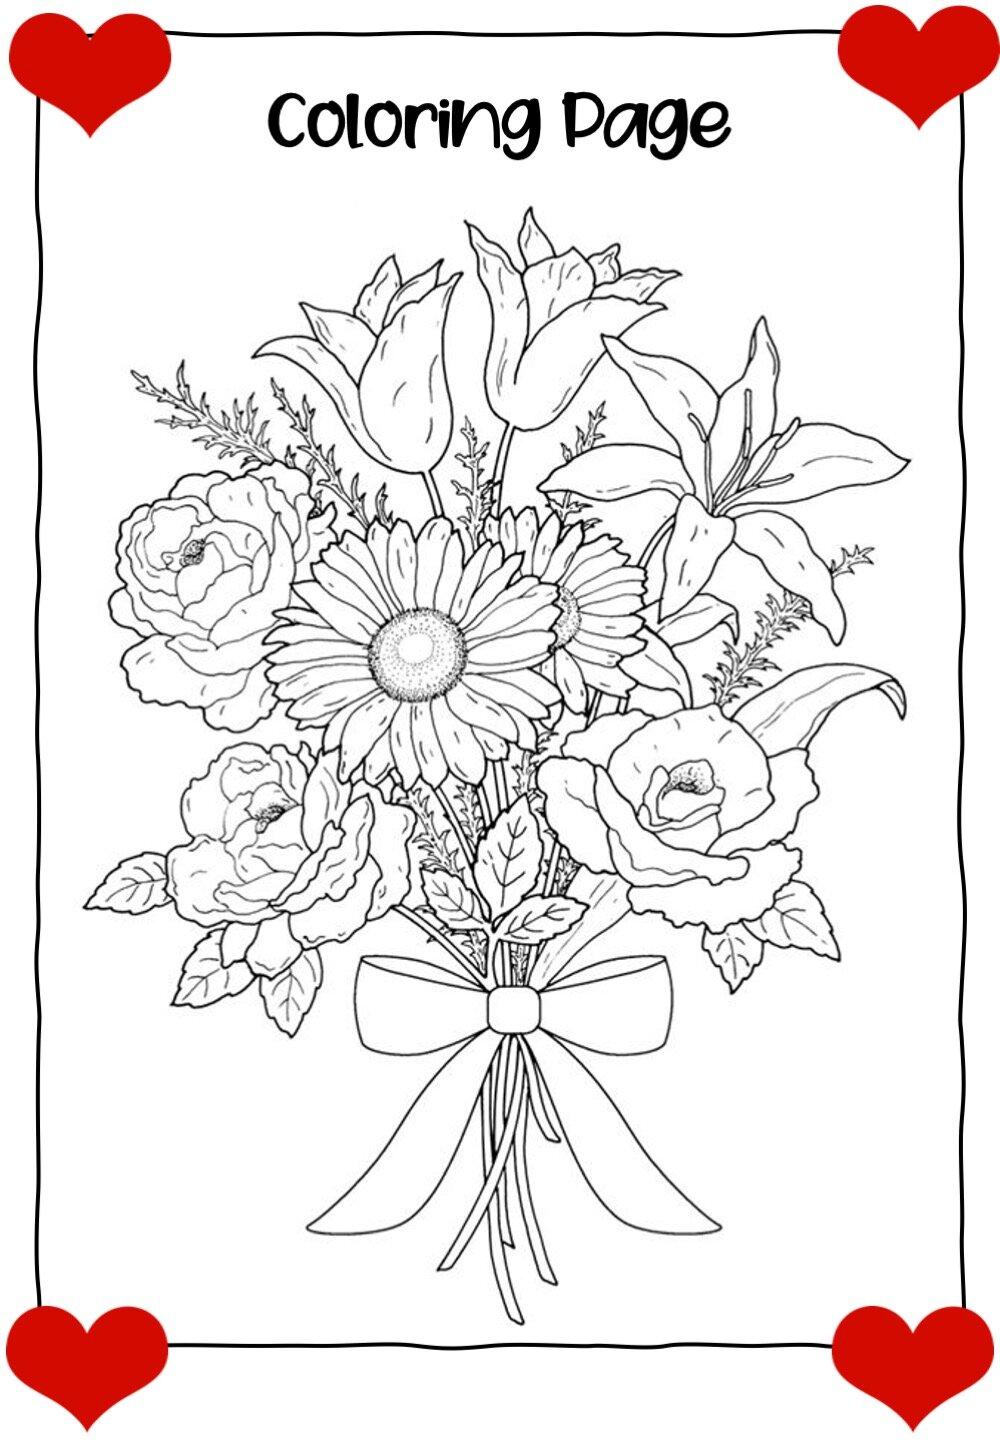 Free Printable Wedding Activity Book For Kids Lemon Kiwi Designs